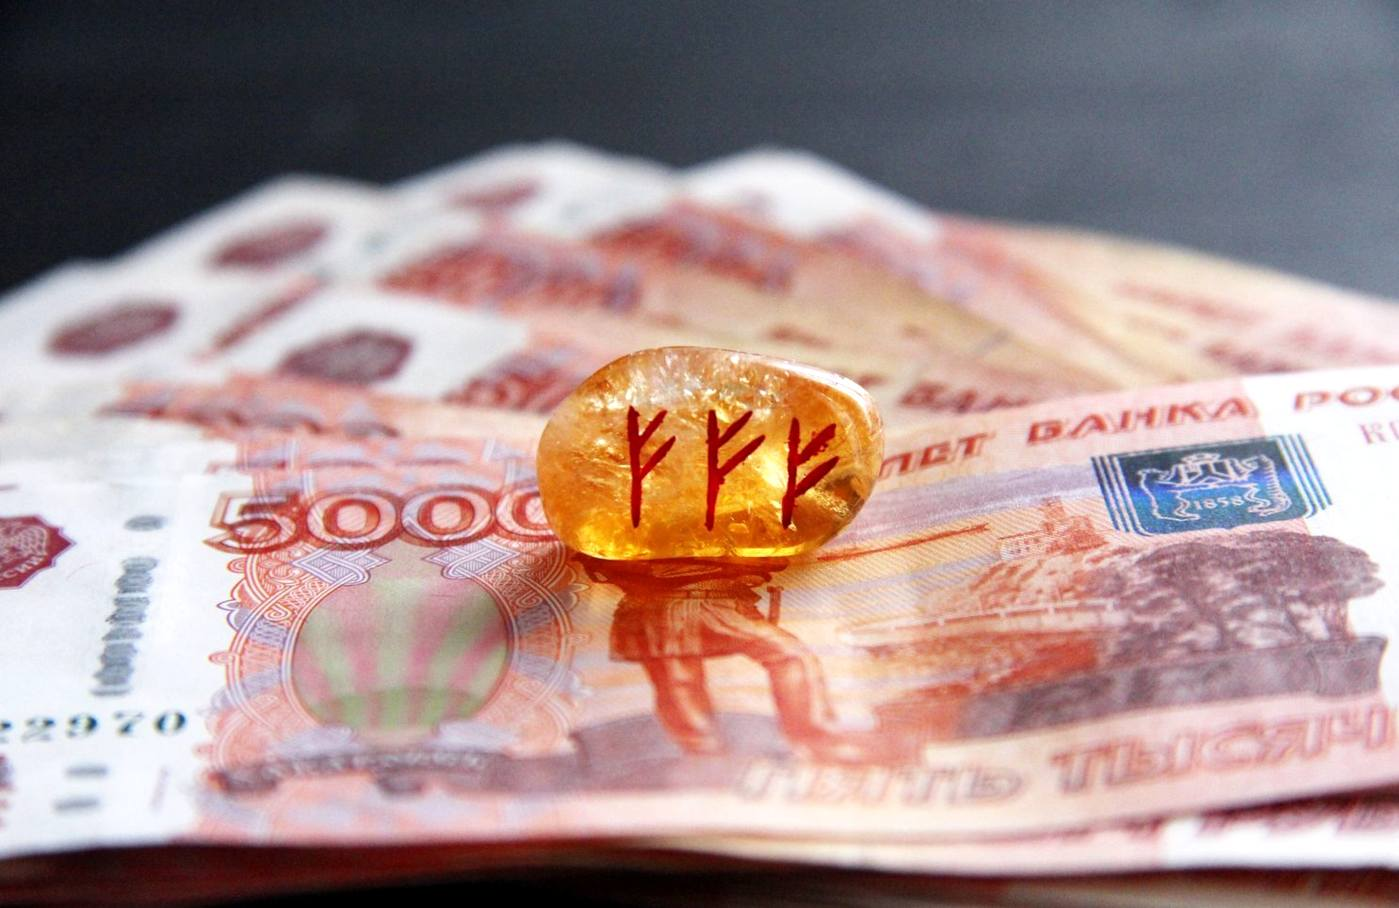 денежная магия фото два лепестка, мажем